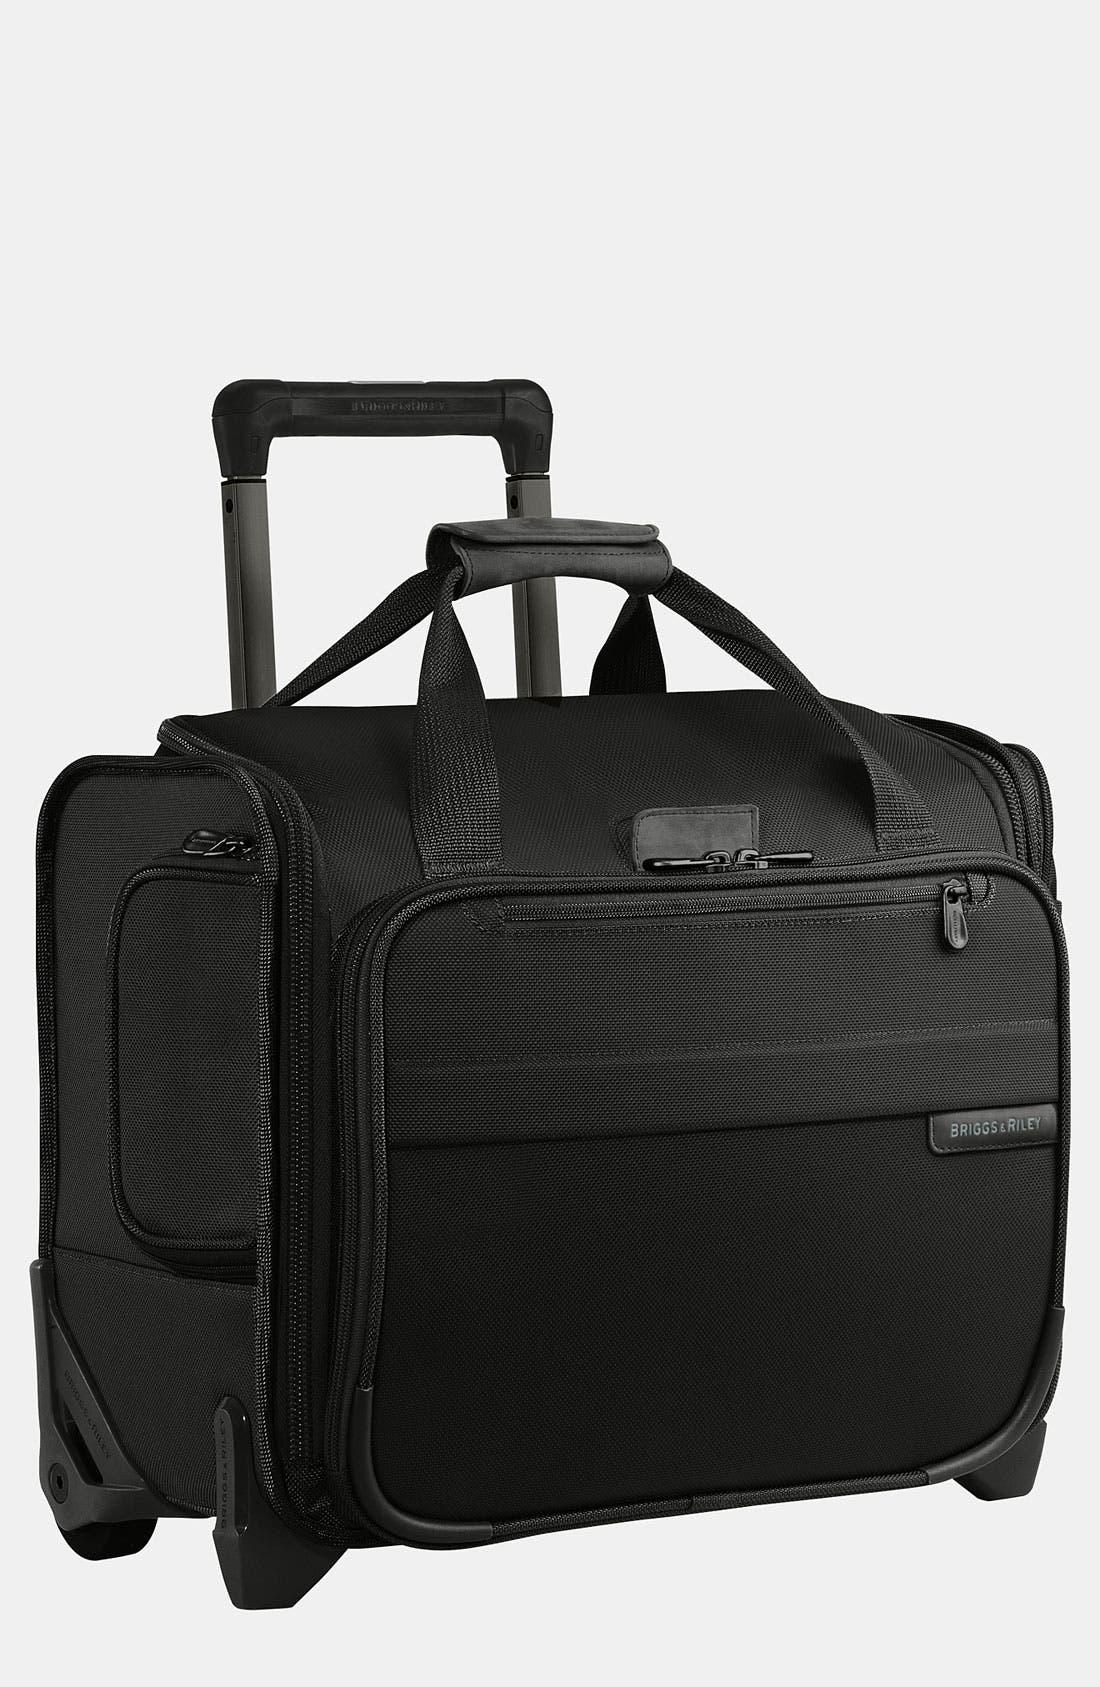 Alternate Image 1 Selected - Briggs & Riley 'Baseline' Rolling Cabin Bag (16 Inch)